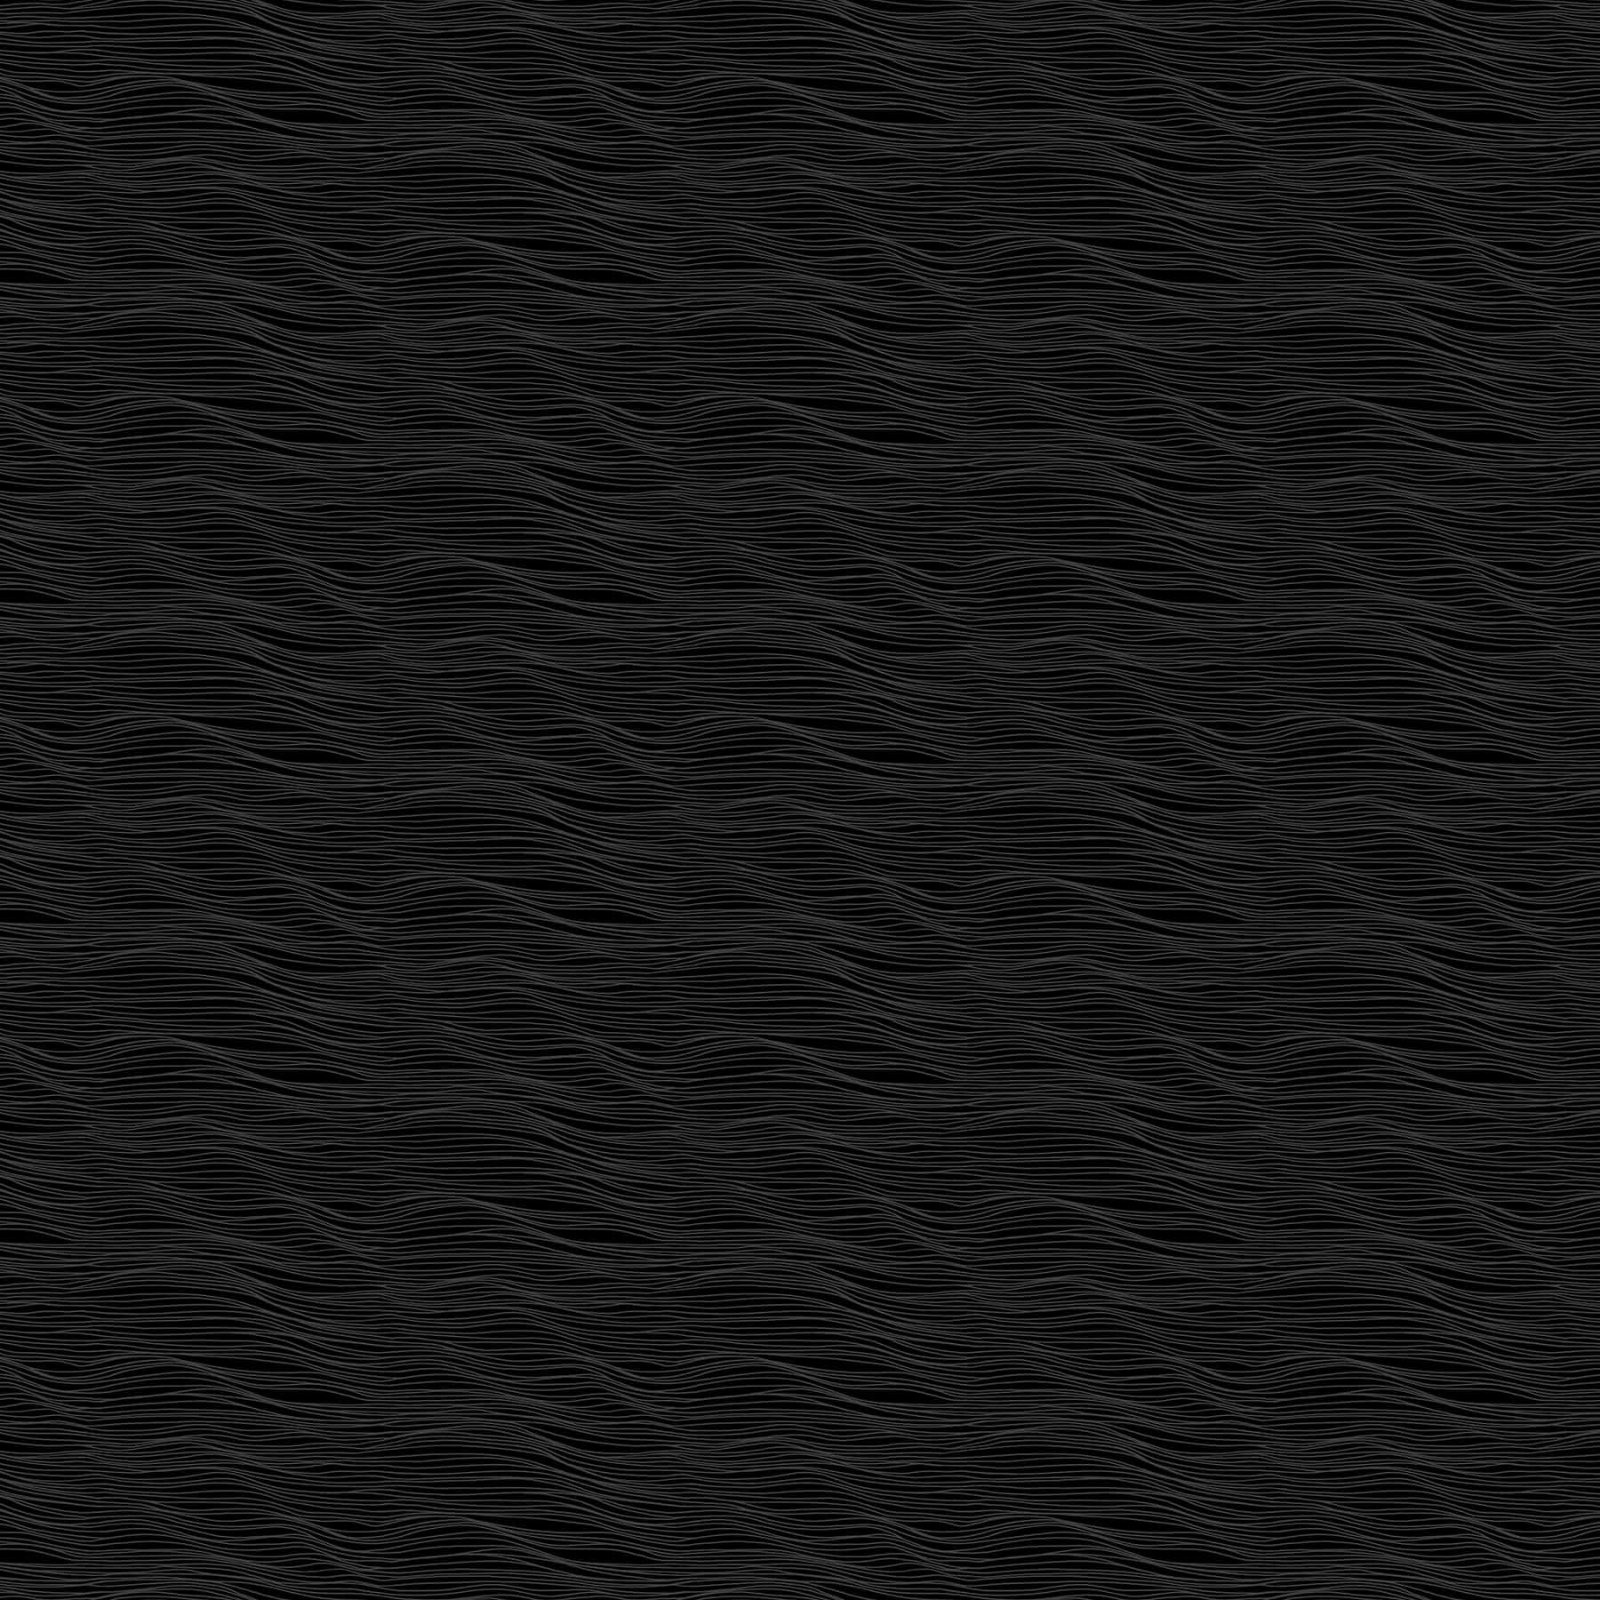 Figo Elements - Waves Black